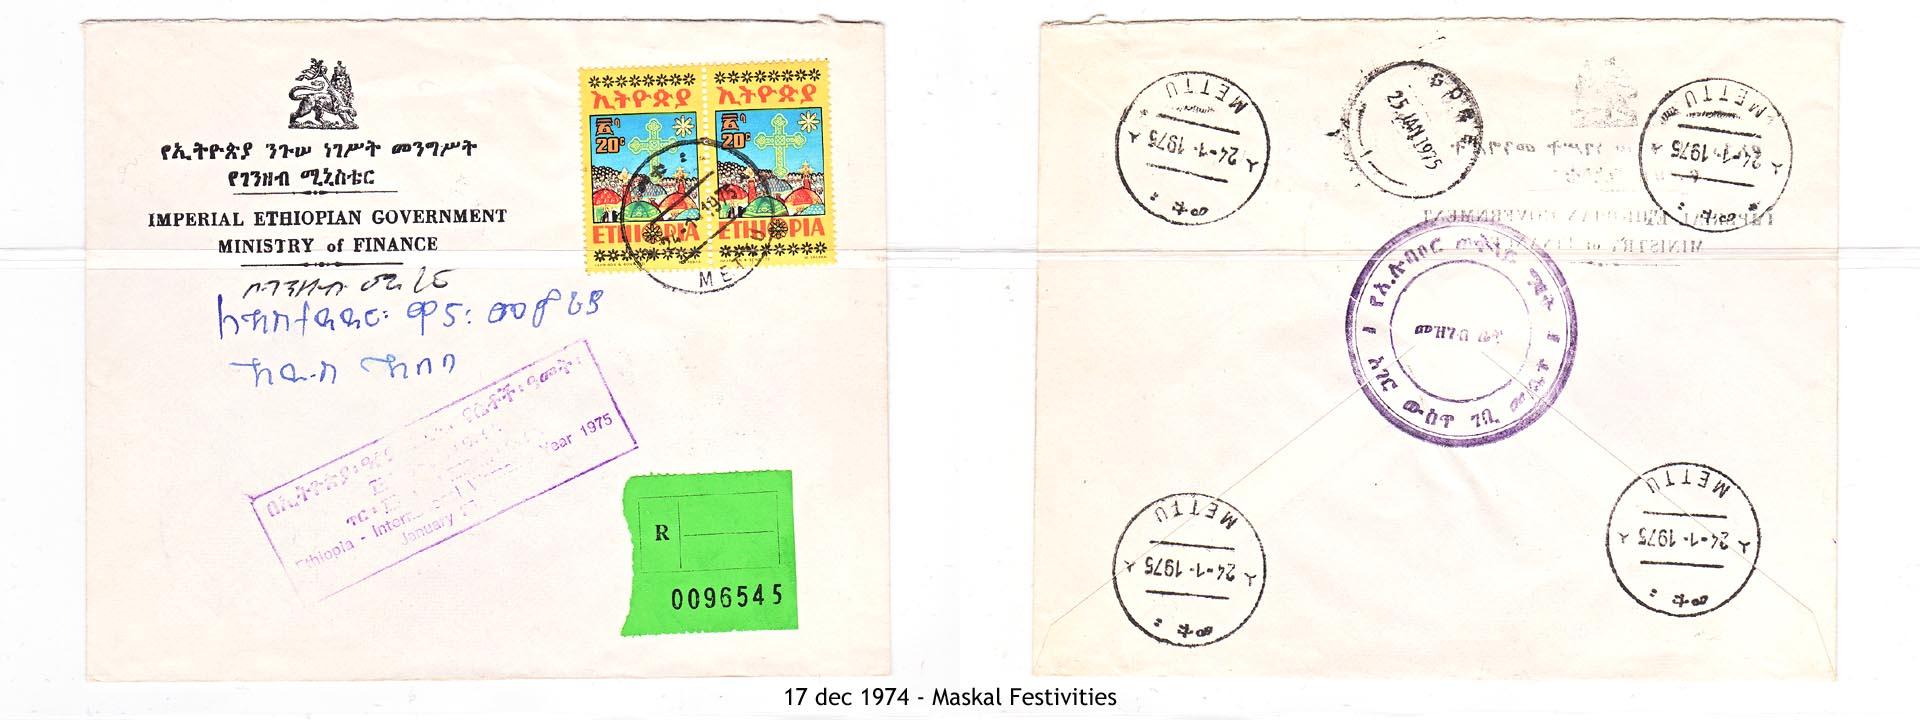 19741217 - Maskal Festivities